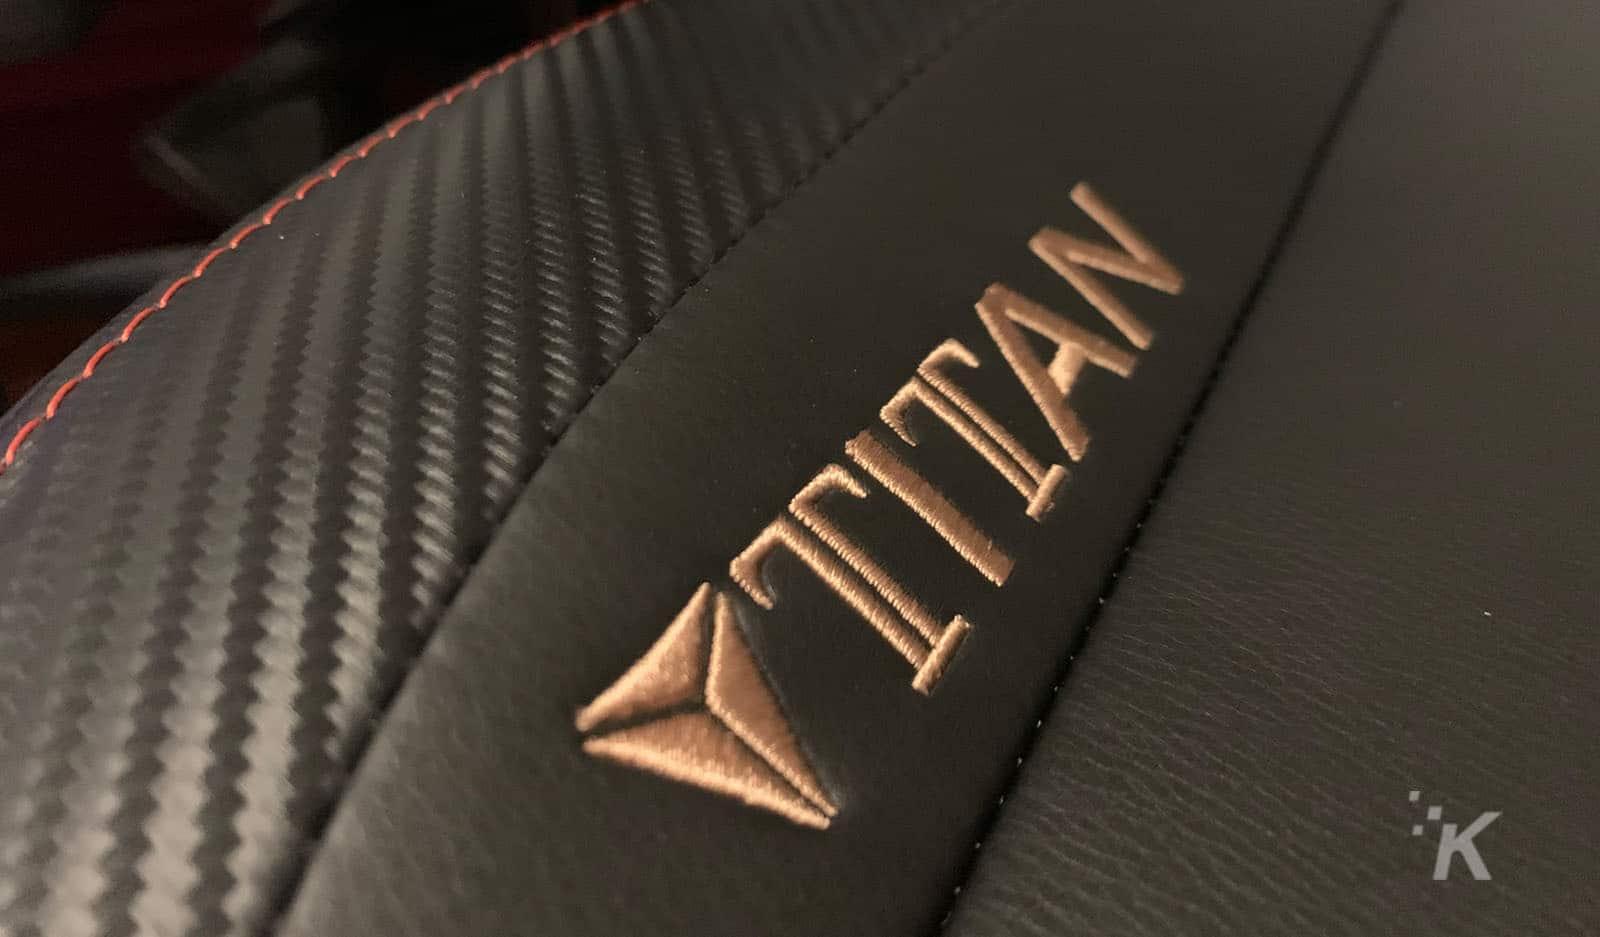 secretlabs titan 2020 chair